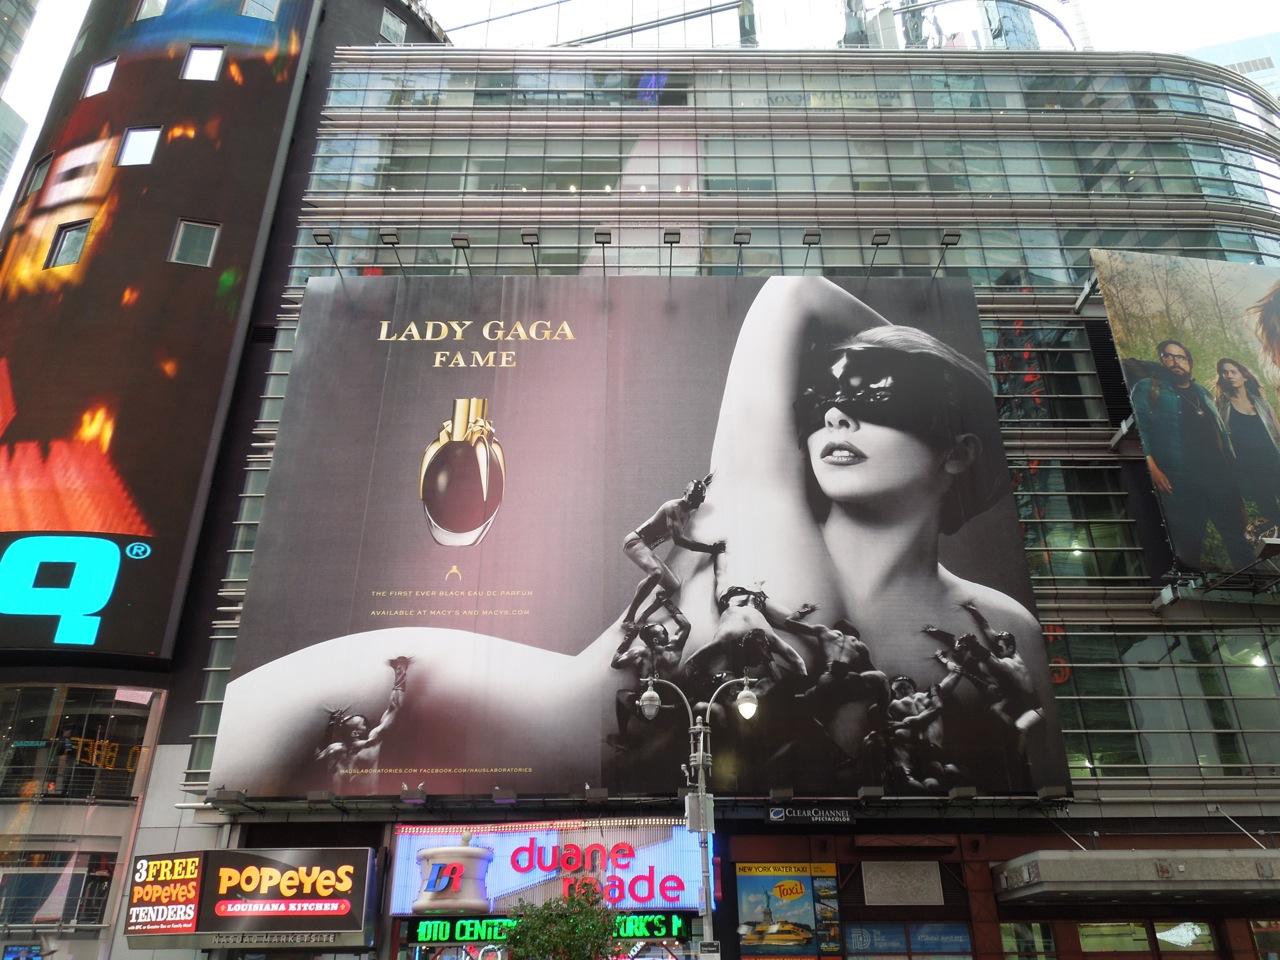 http://4.bp.blogspot.com/-zKbzul9D6wM/UEe9YMtVZZI/AAAAAAAAzTc/IBm-t3N18Hs/s1600/LadyGaga+Fame+fragrance+billboard.jpg